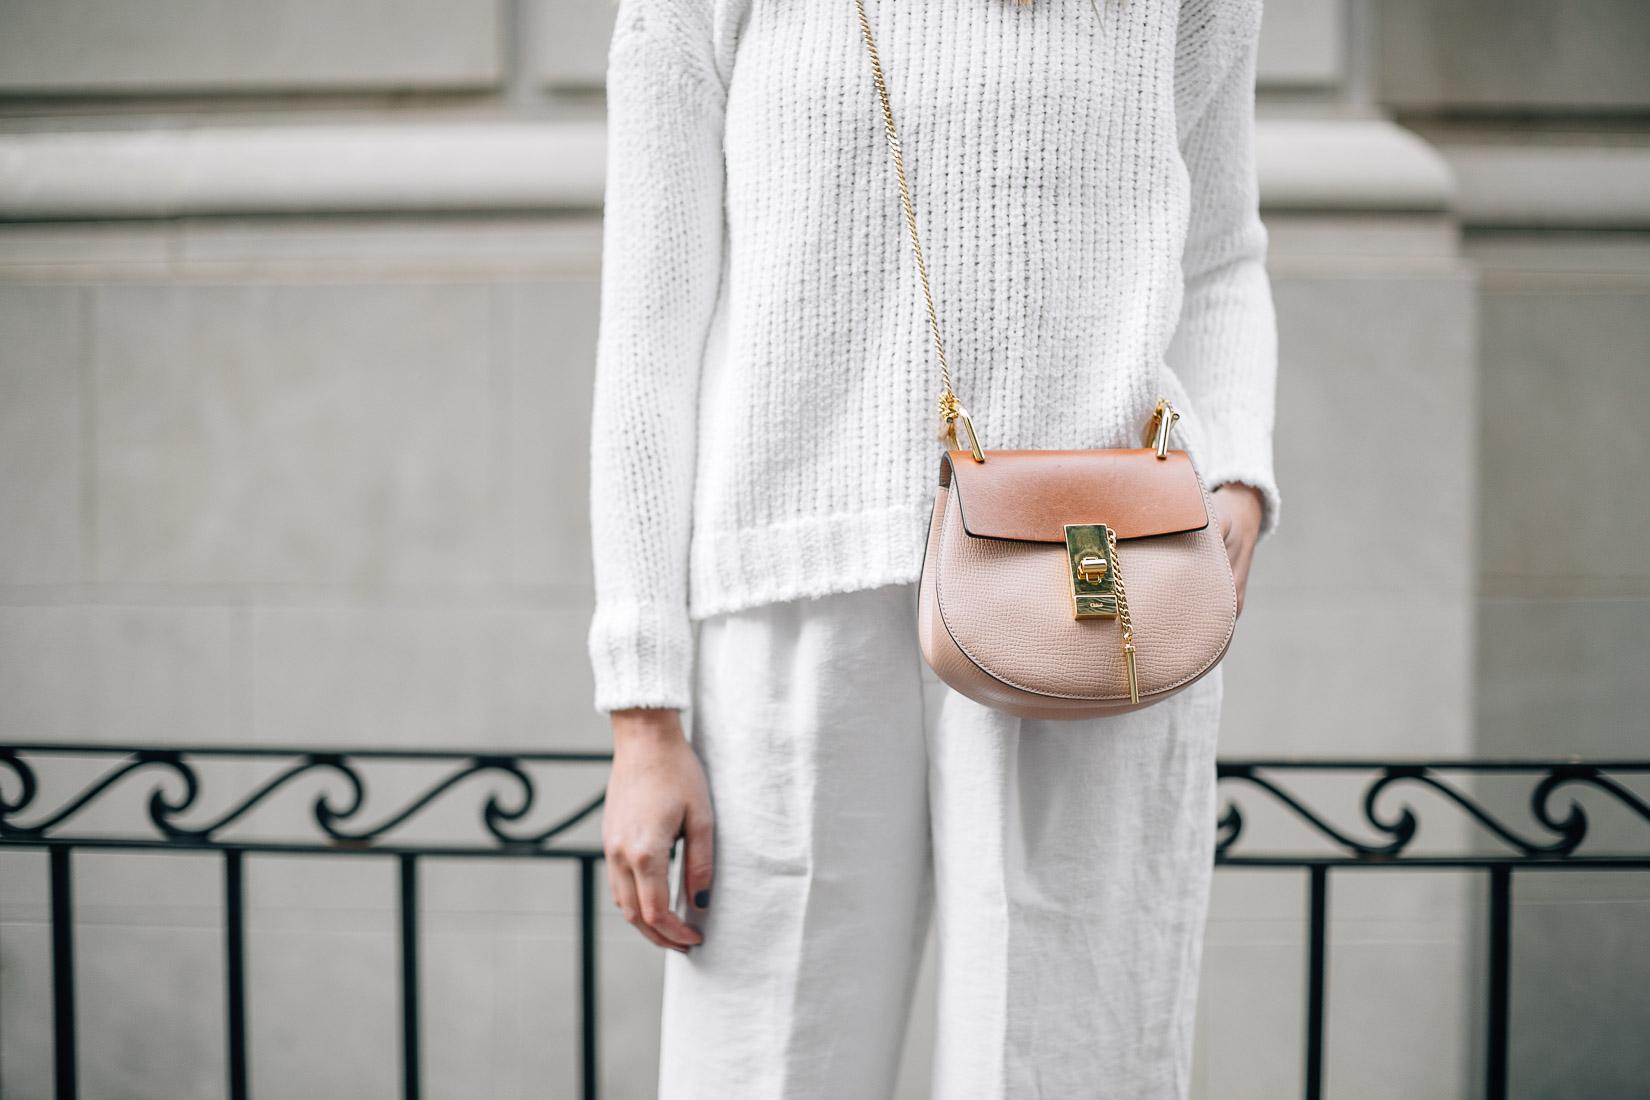 fashion-jackson-chloe-drew-handbag